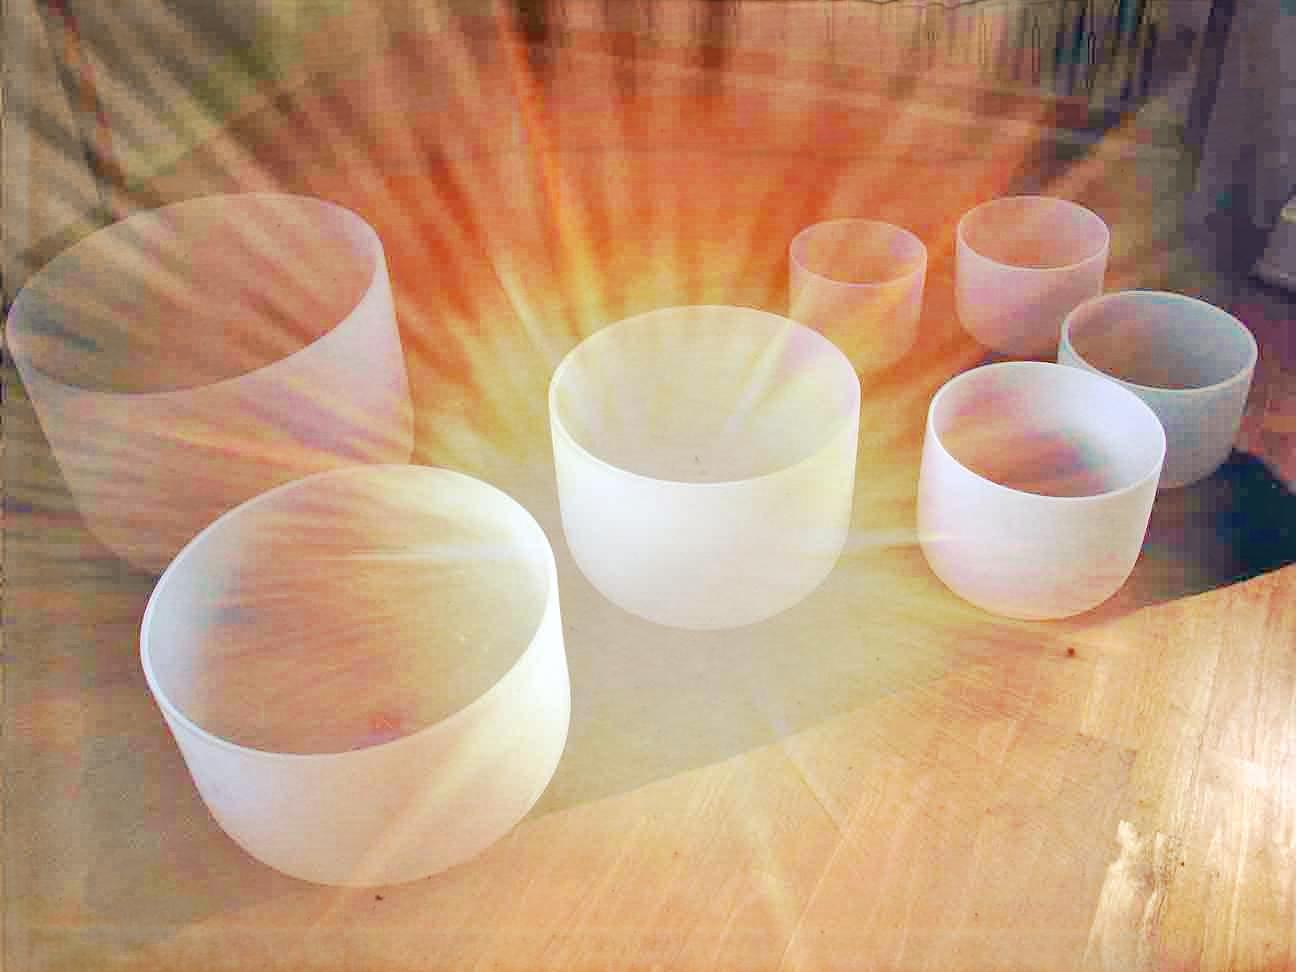 Crystal-Singing-Bowls-energy.jpg